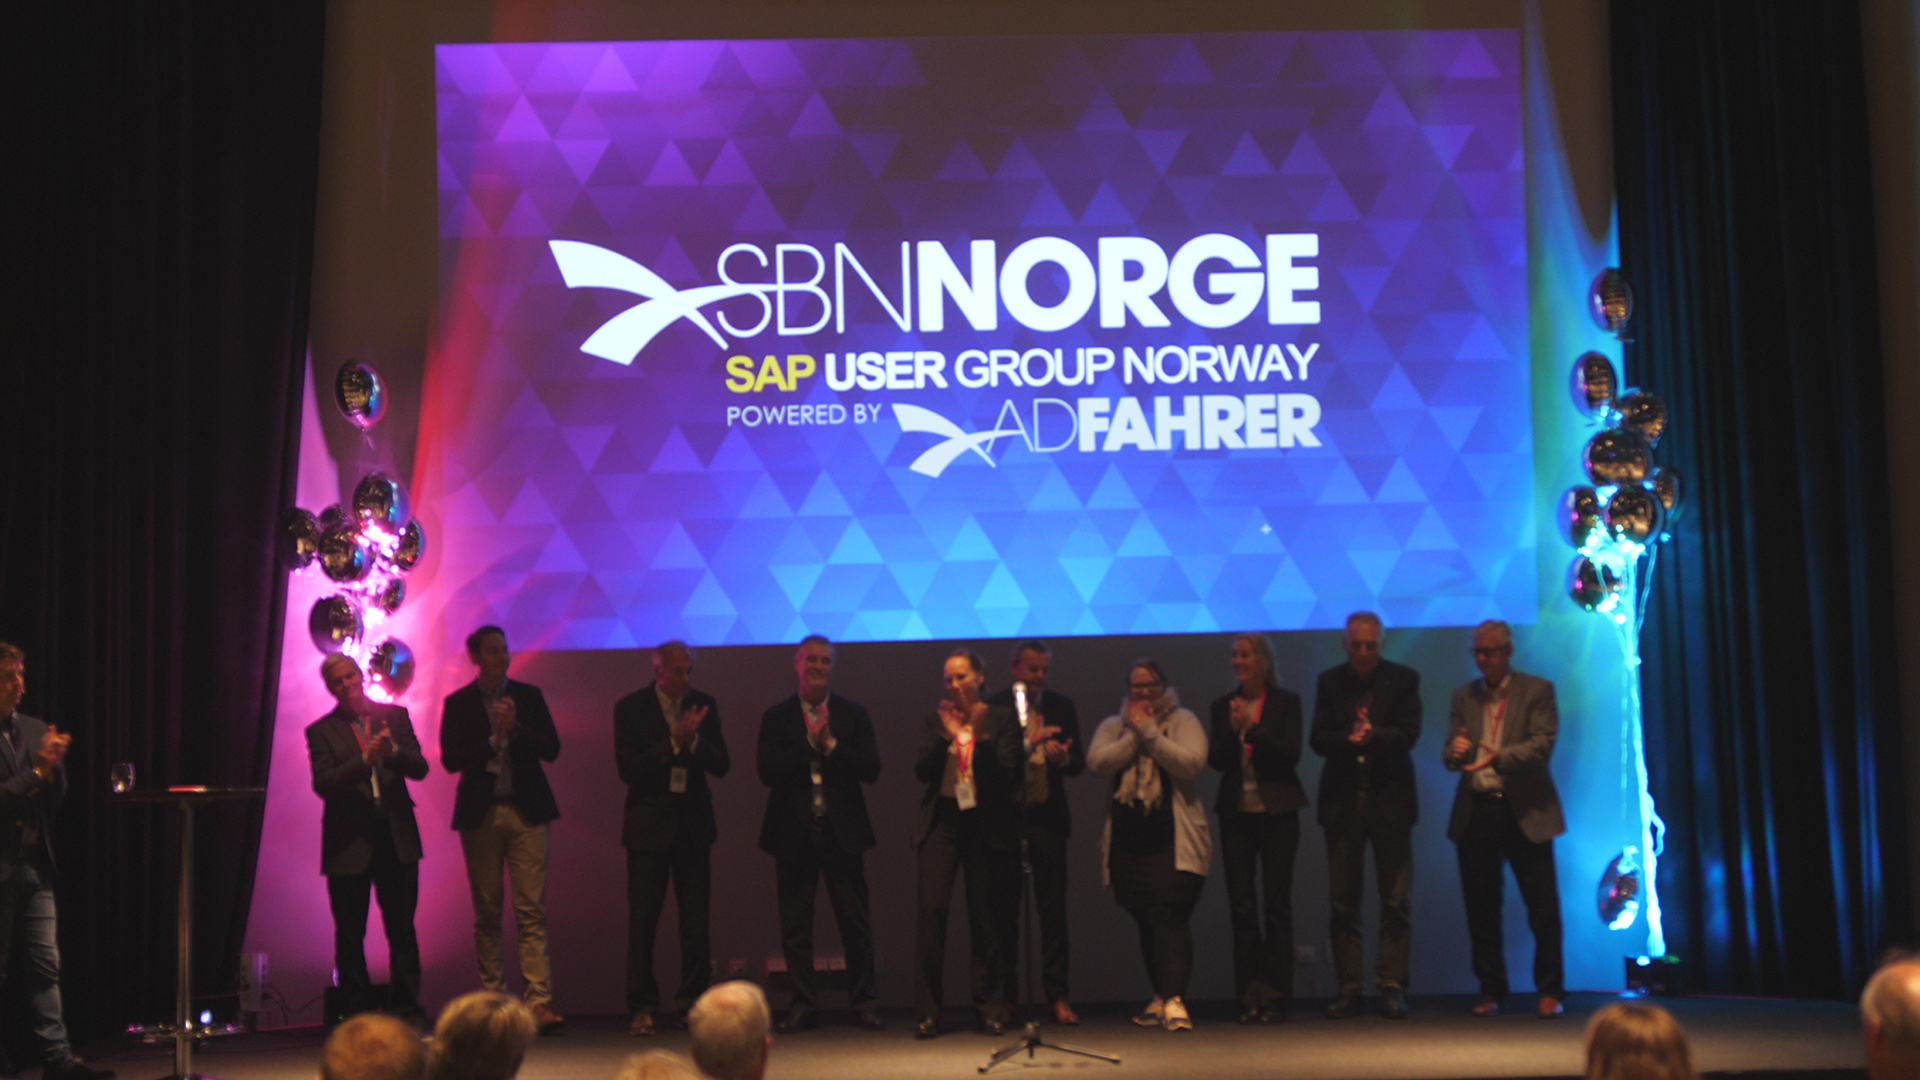 SBN Conference 2019